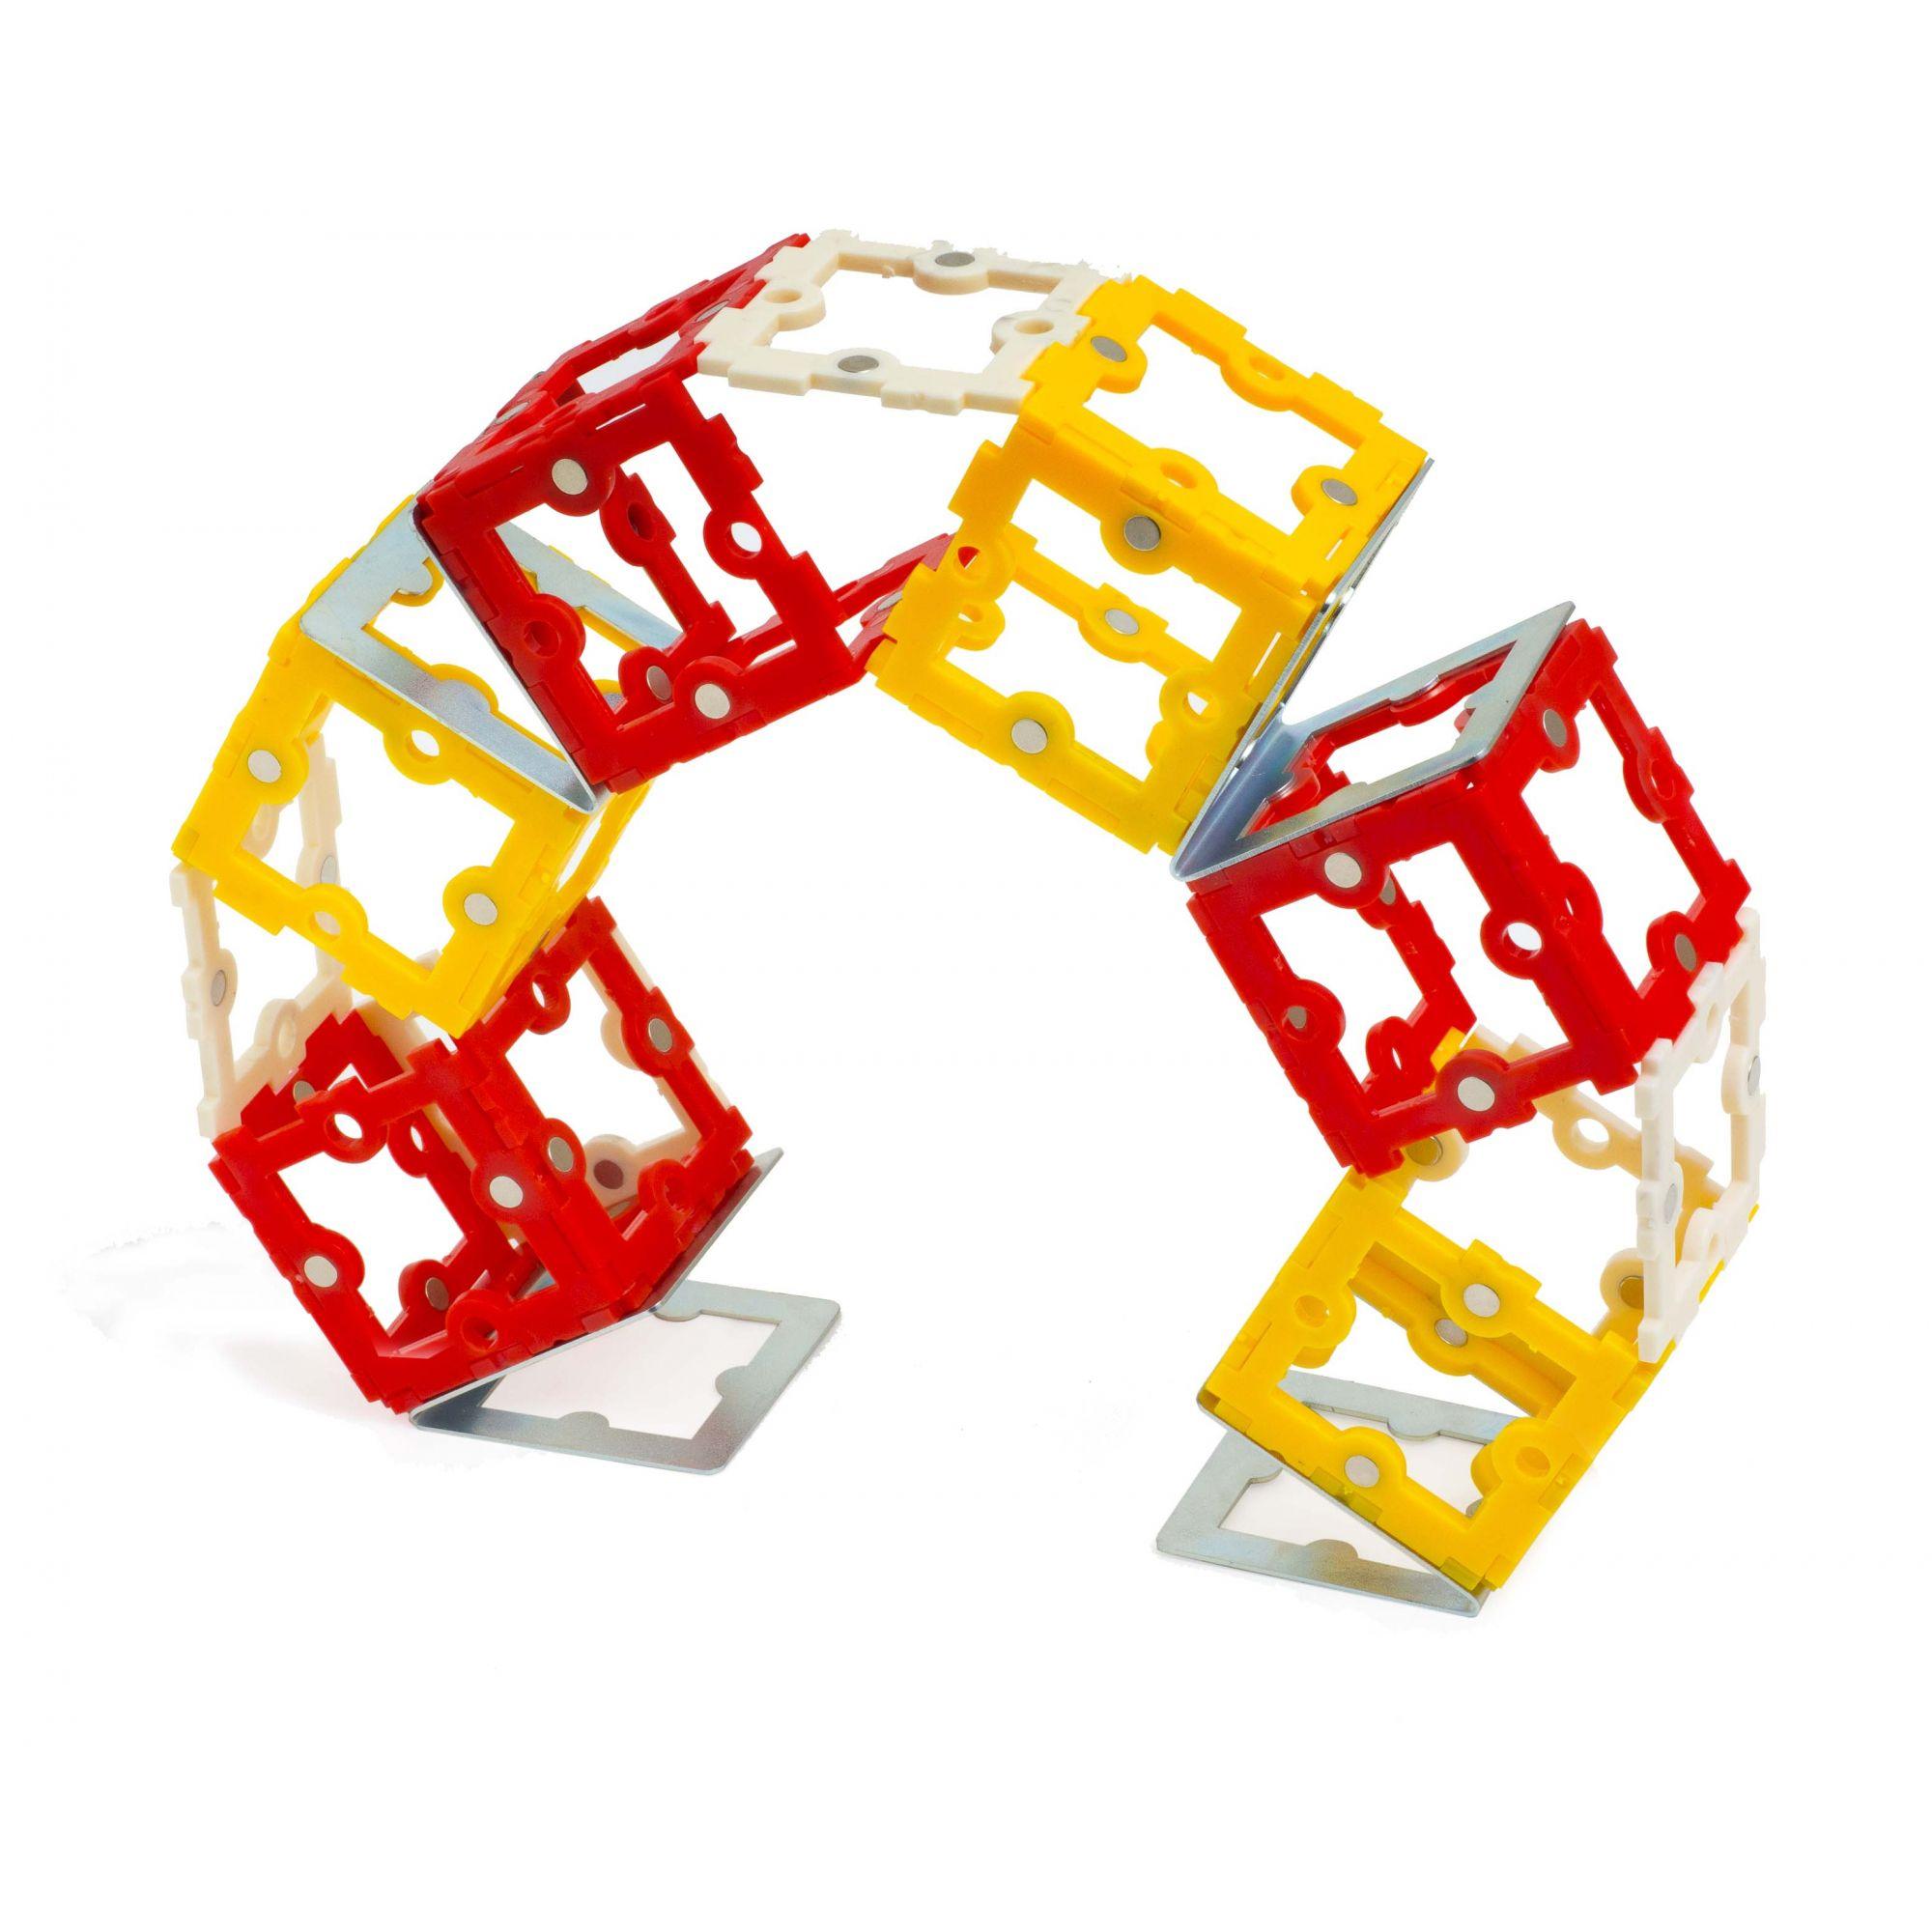 Tekton 86 Blocos de Montagem Magnetizados STEM TOY  - Place Games